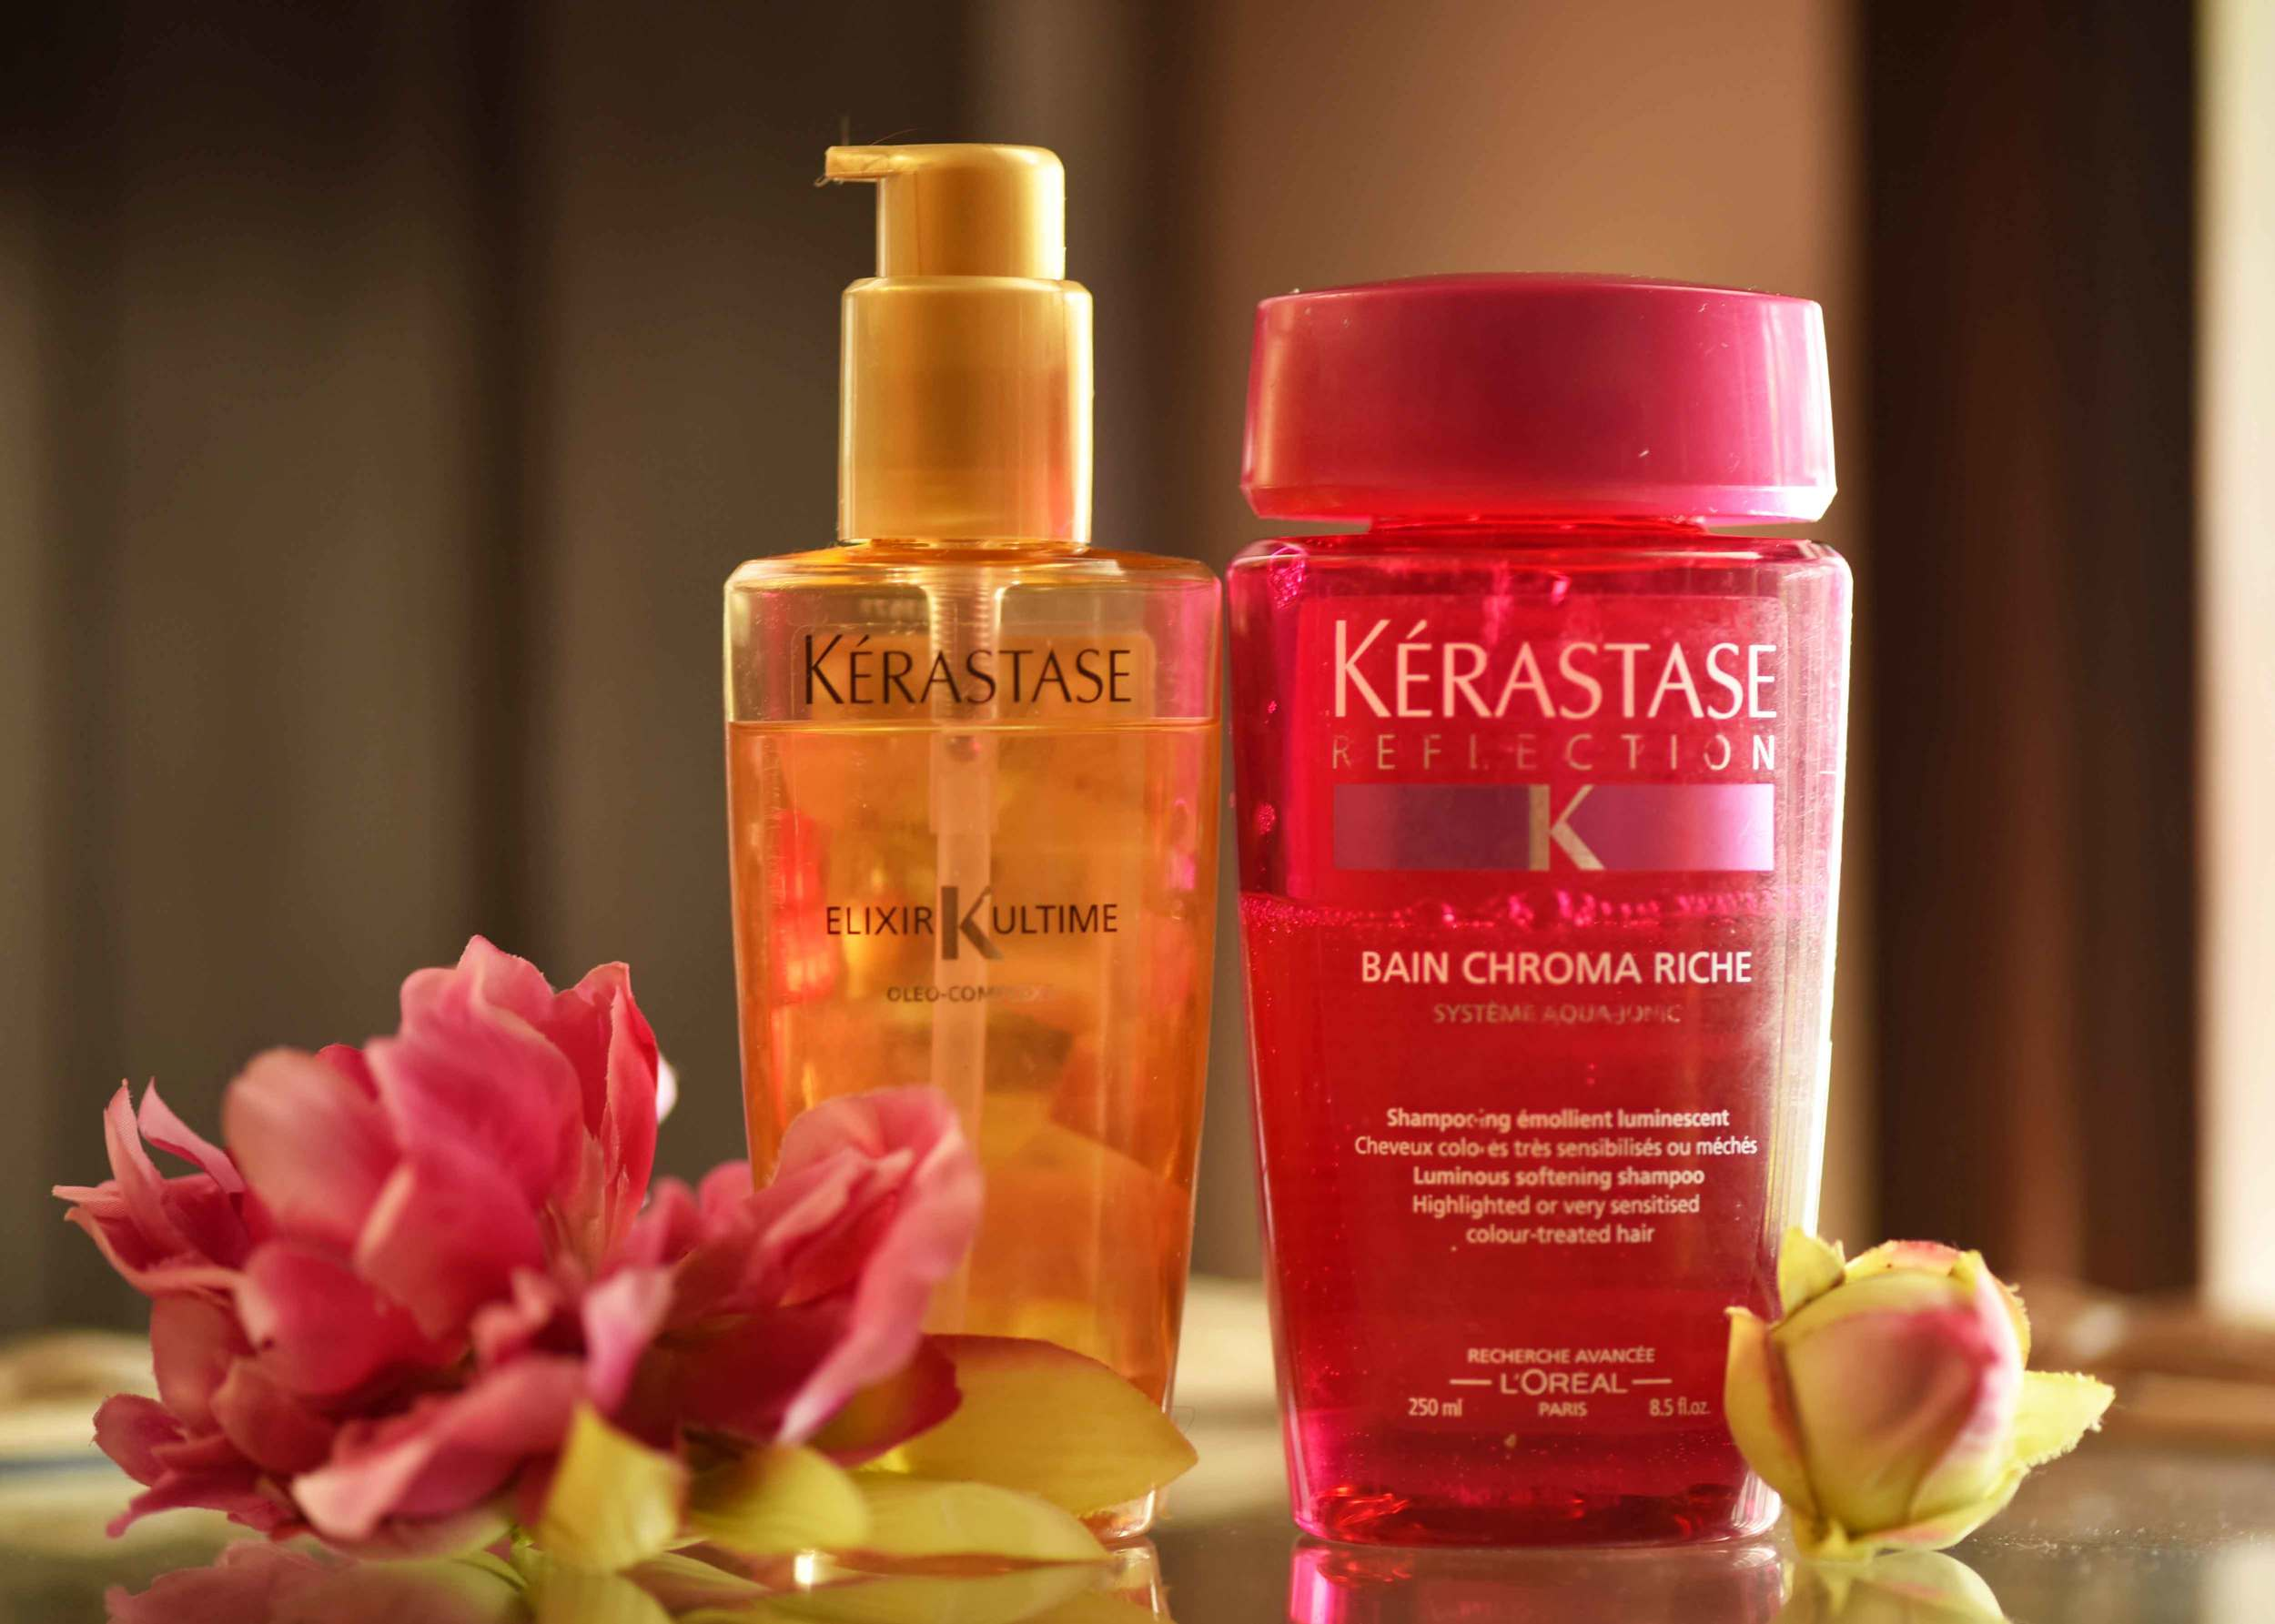 Kerastase Elixir Ultime oil and Kerastase Reflection Bain Chroma Rich shampoo. Image©gunjanvirk